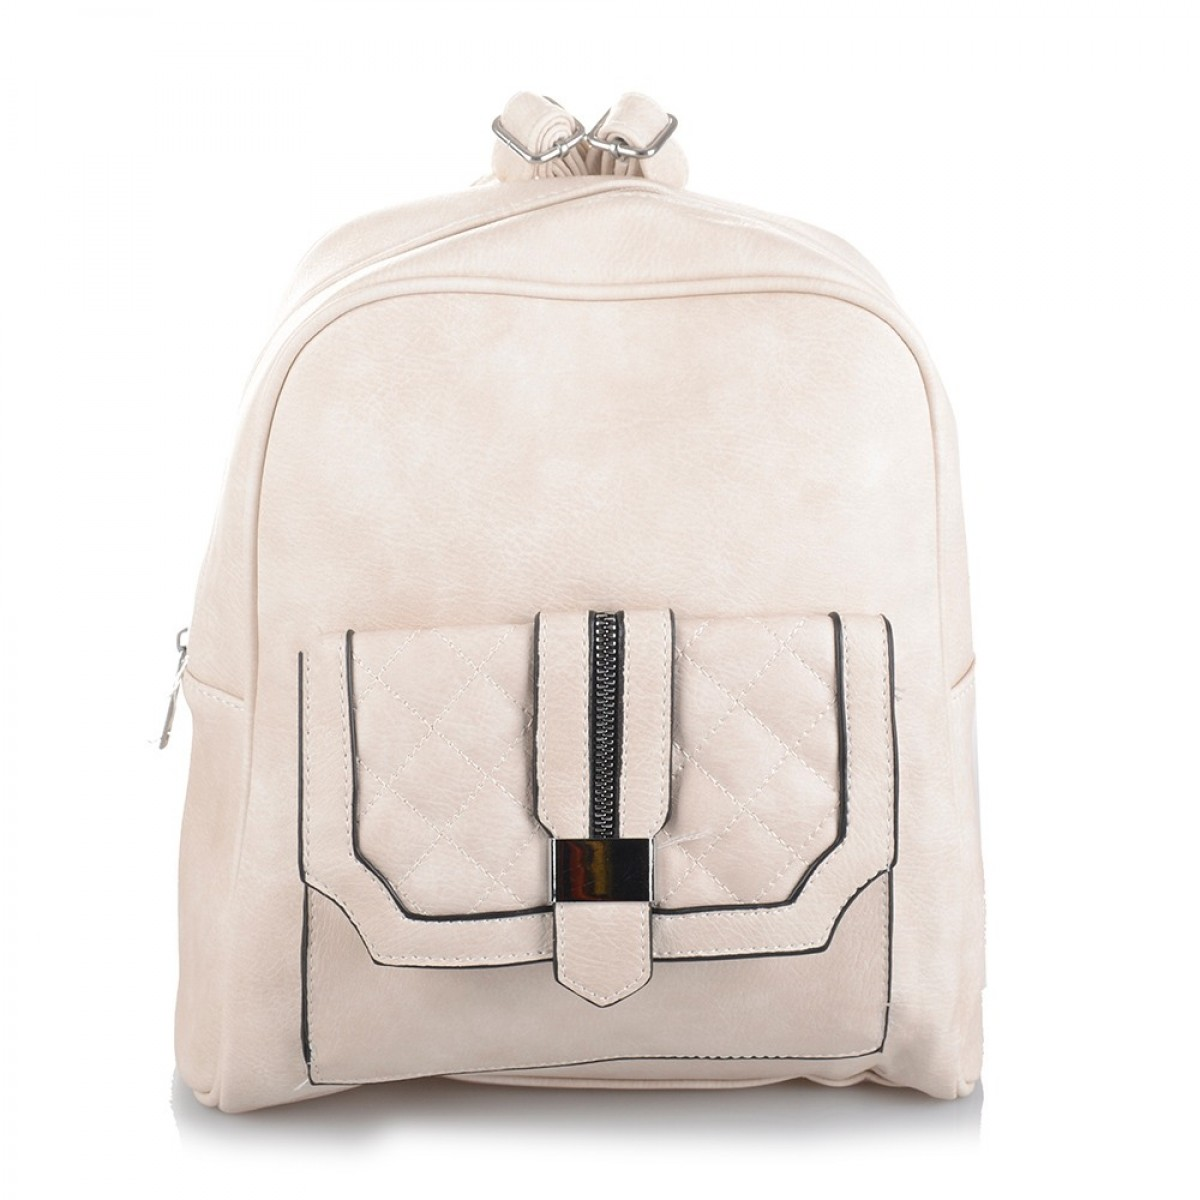 Backpack No 1053B - Μπεζ